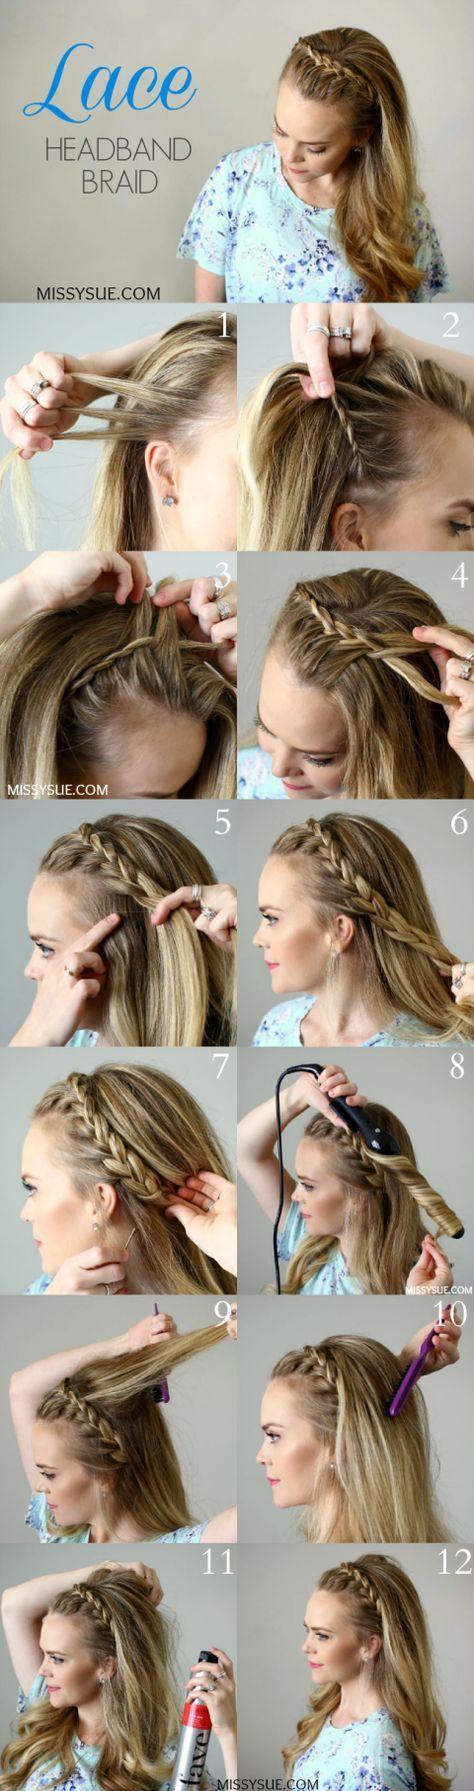 Petit tutoriel beauty pinterest headband braids lace